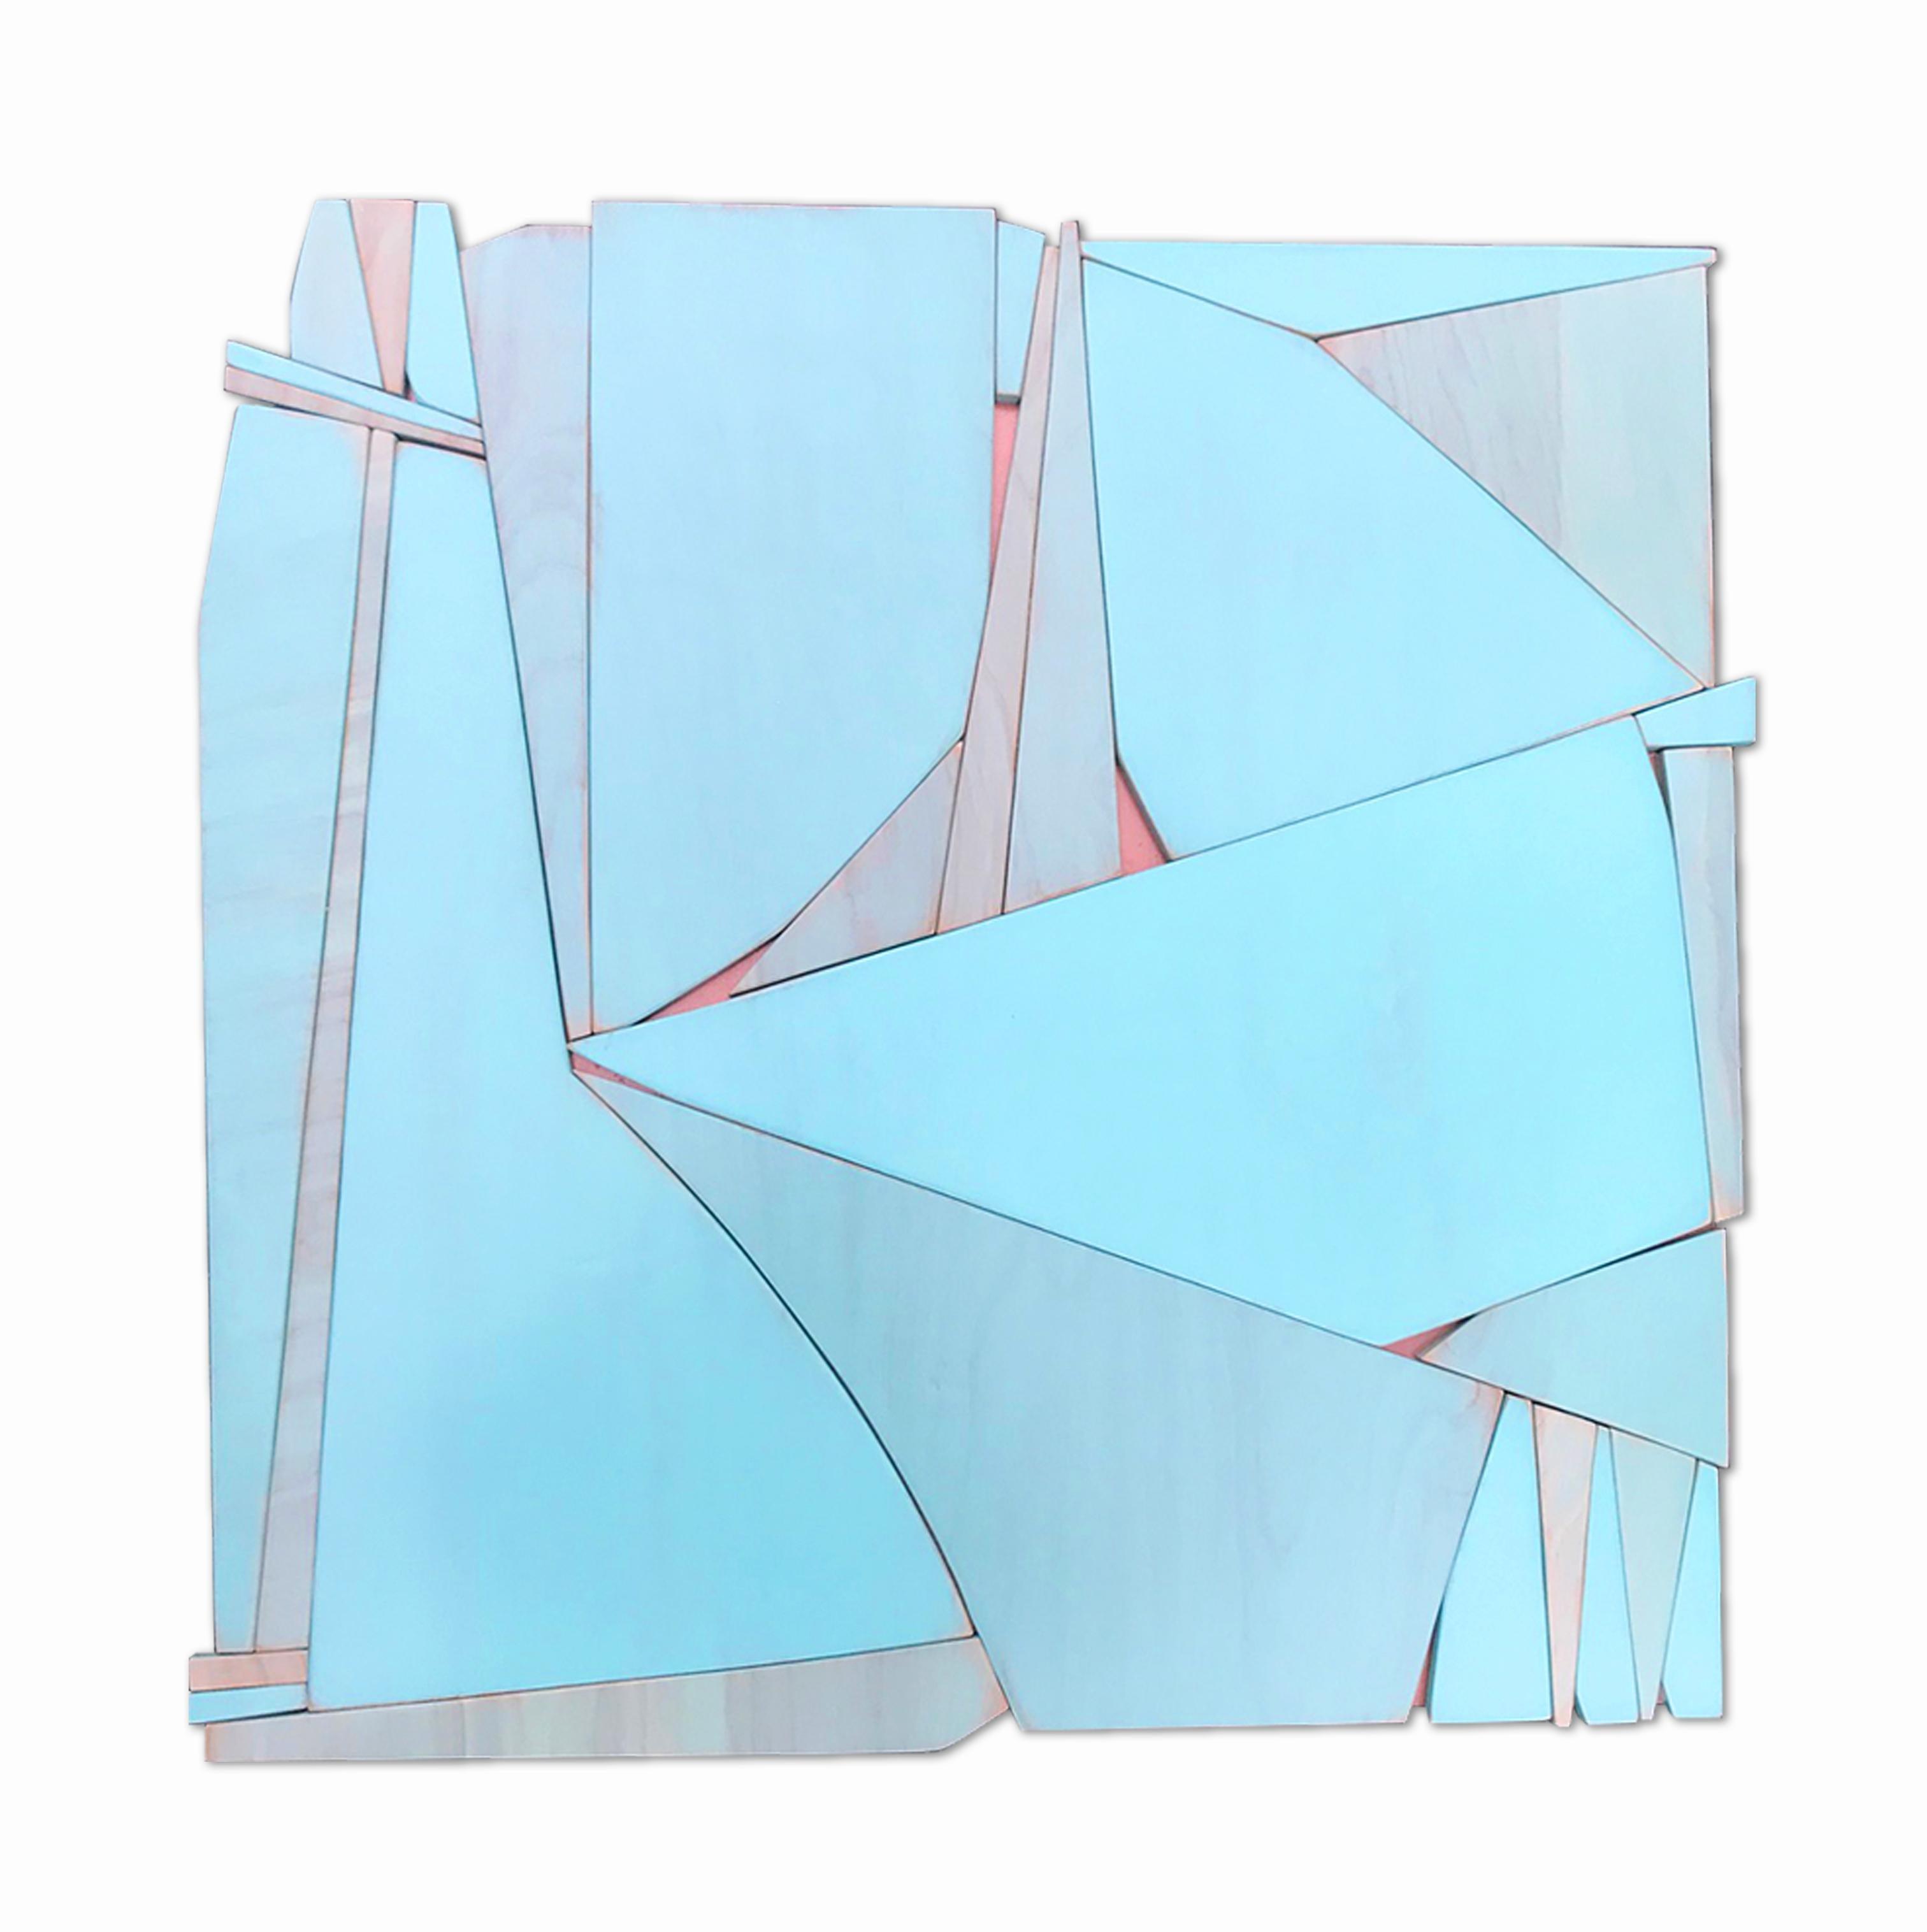 Tiki Miami (modern abstract wall sculpture minimal geometric design blue art)